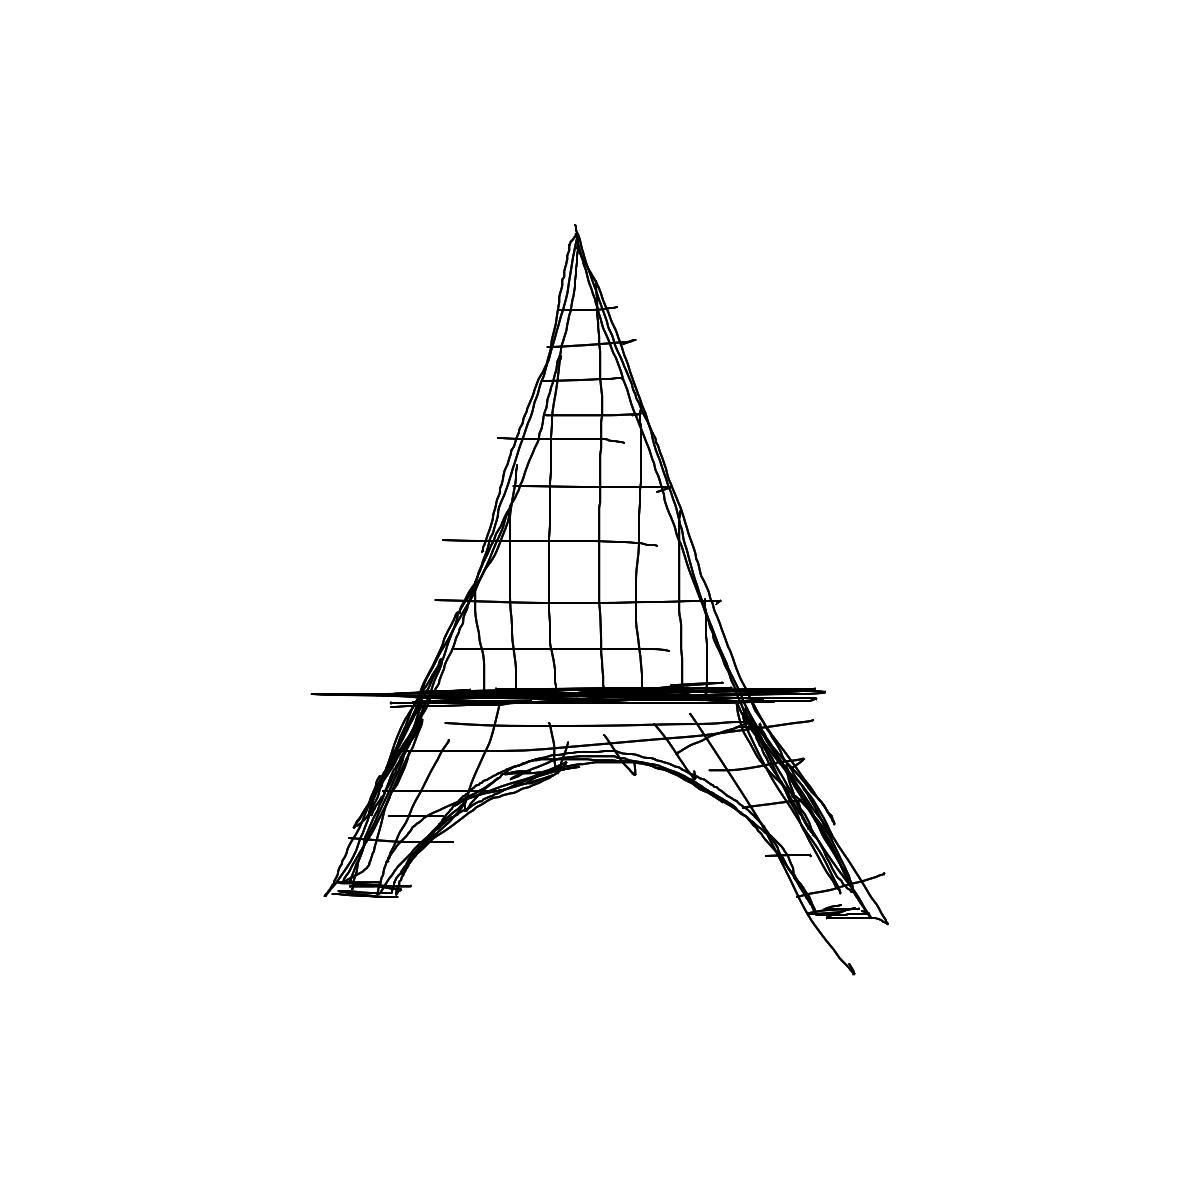 BAAAM drawing#729 lat:48.8586311340332000lng: 2.2941896915435790